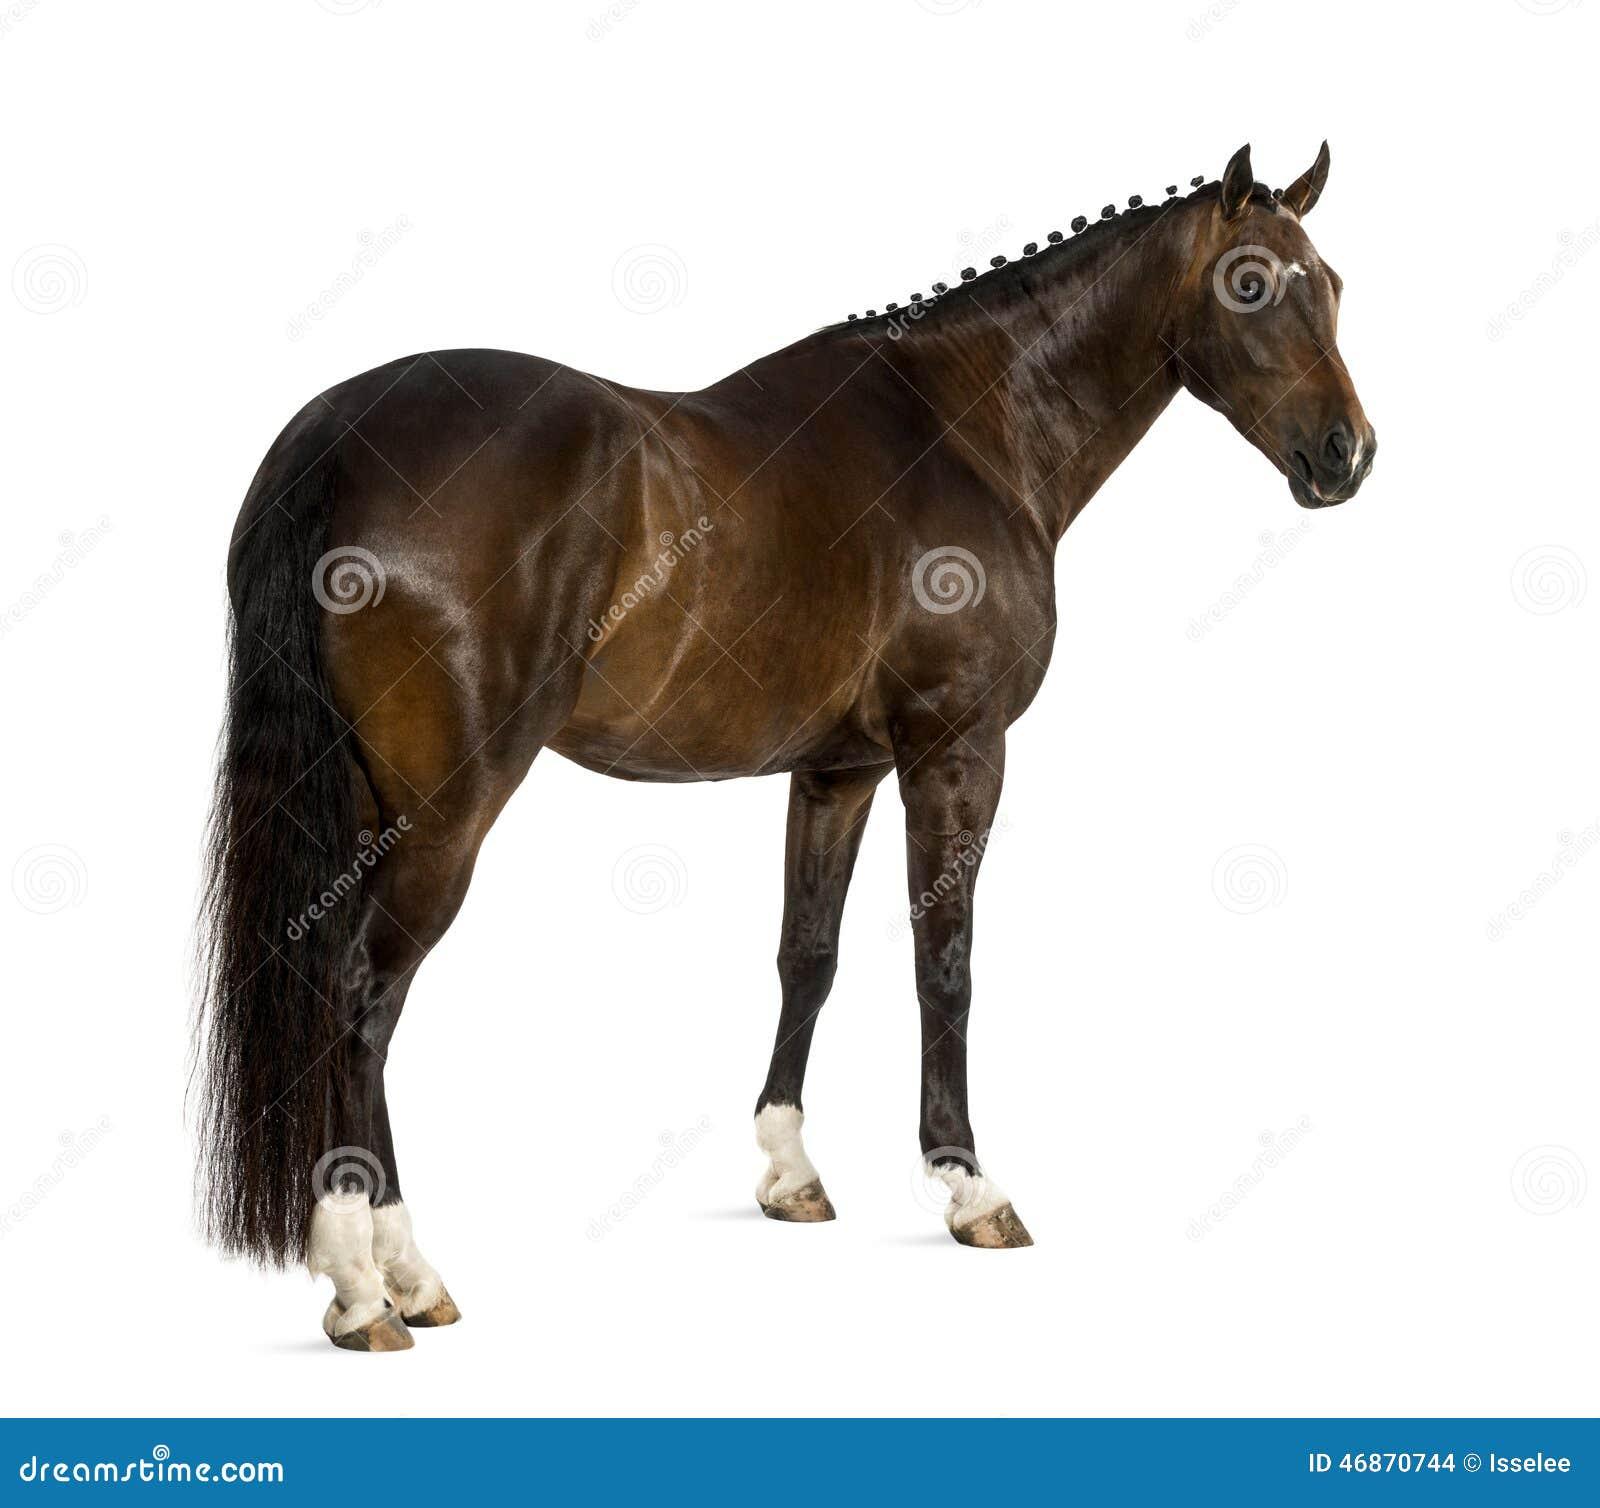 KWPN - Dutch Warmblood, 3 years old - Equus ferus caballus